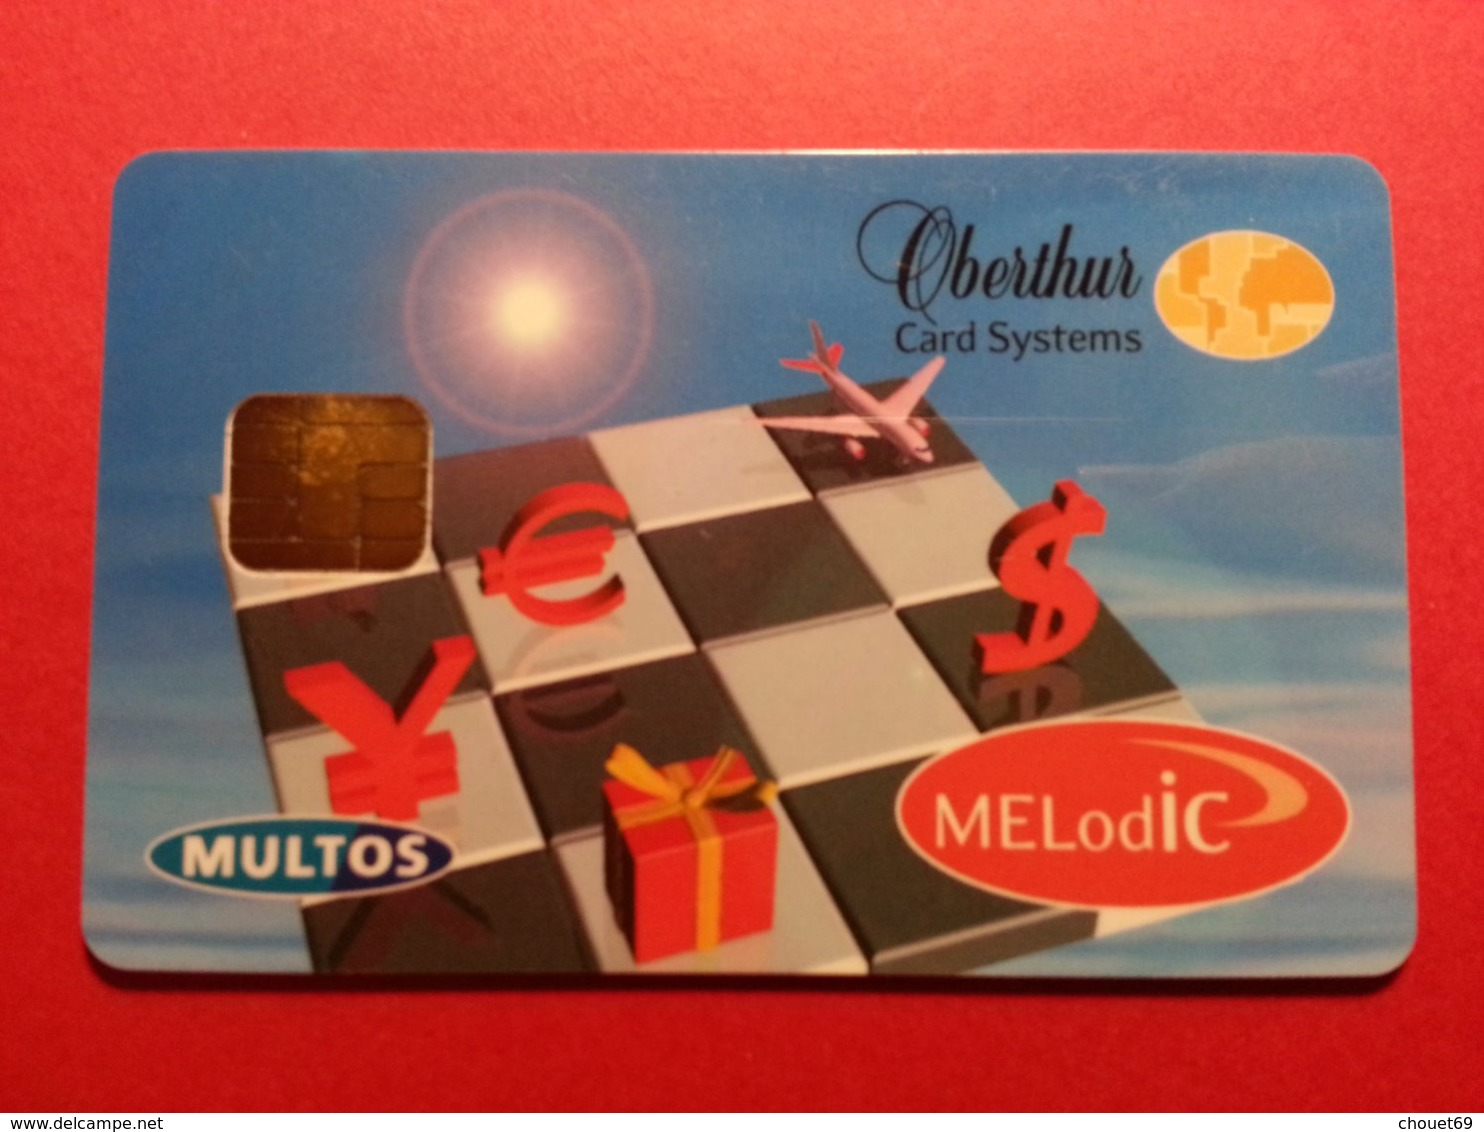 OBERTHUR DEMO TEST CARD MELODIC MELodIC MULTOS Smart (FB1217) - Herkunft Unbekannt